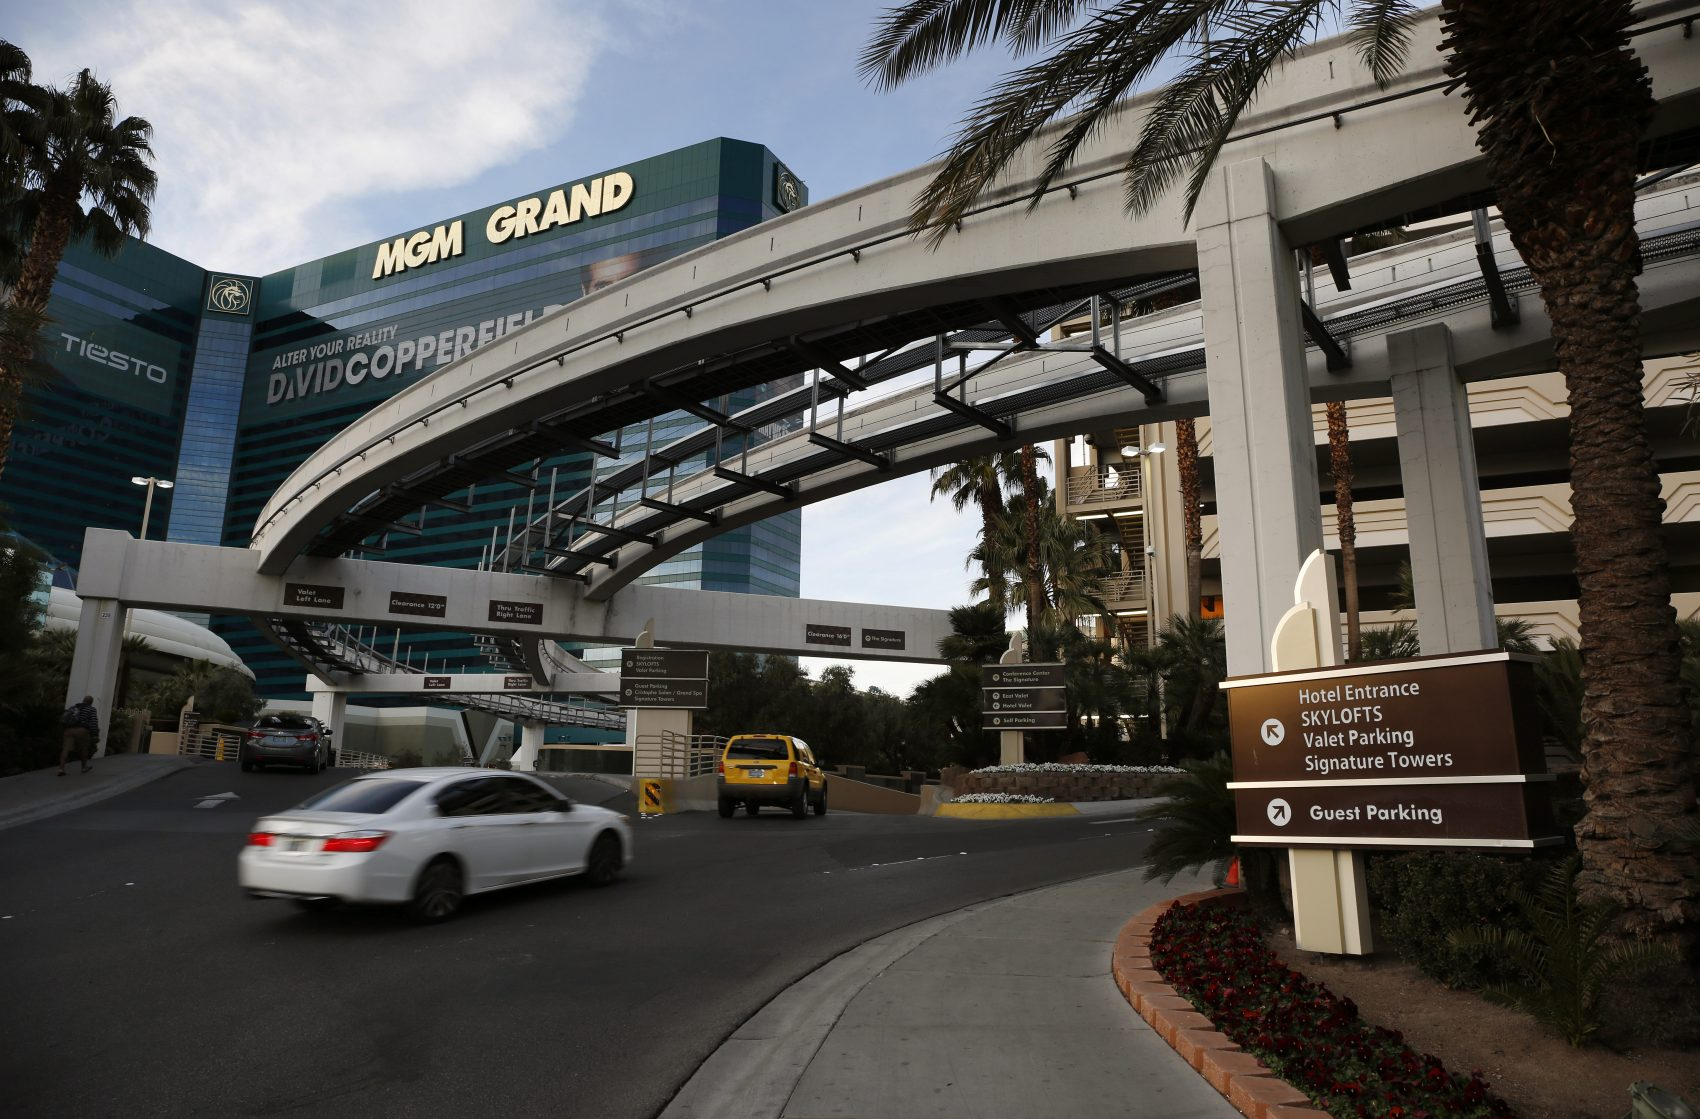 Parking At Mgm Grand Las Vegas